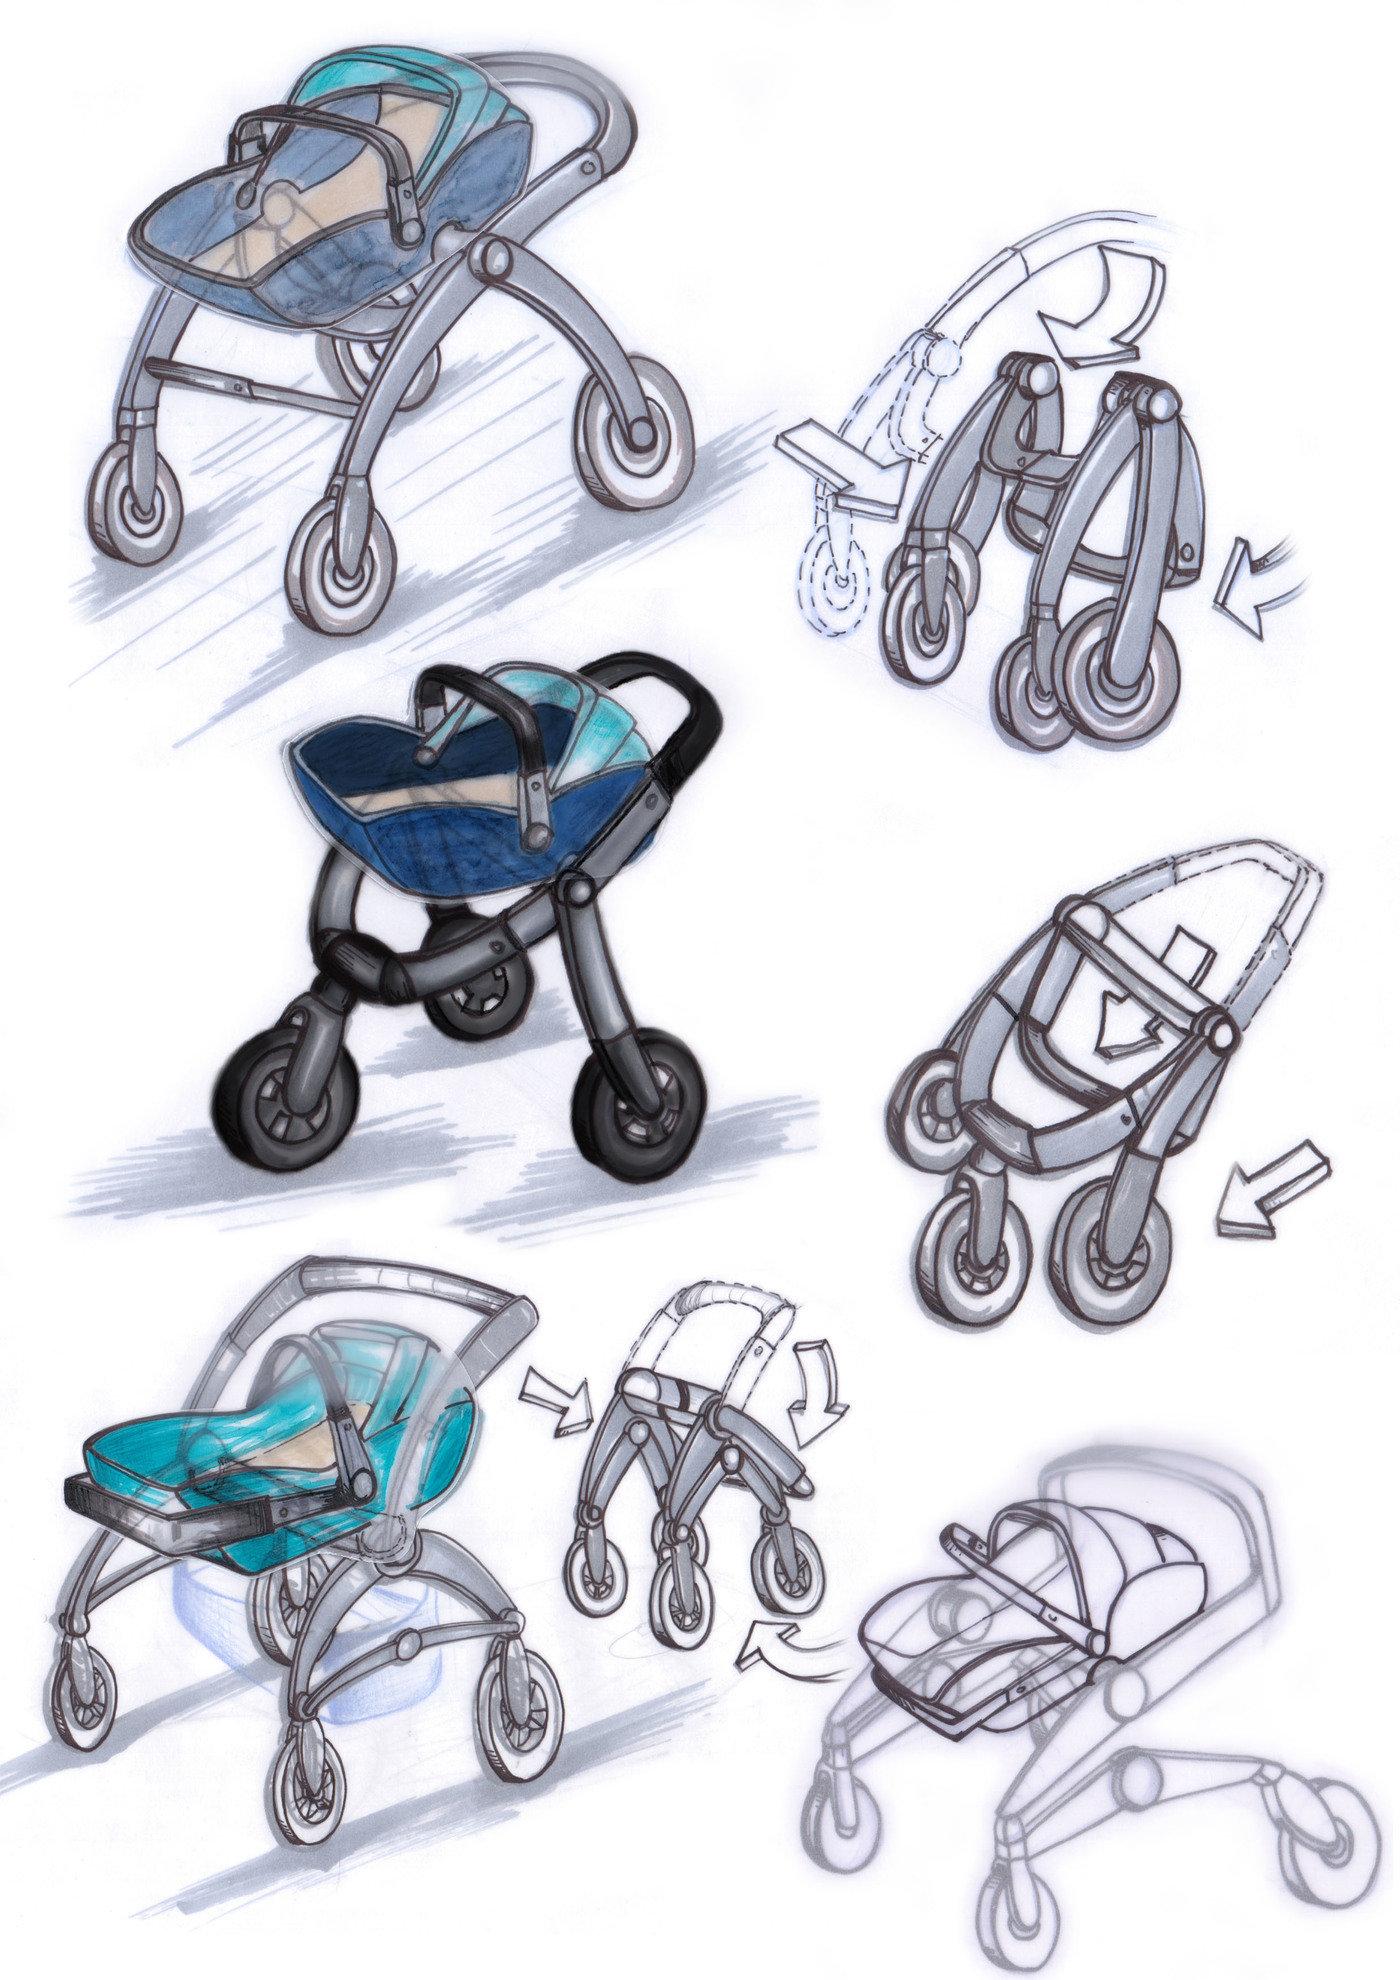 Concept Design For A New Baby Pram By Adriana Garcerá